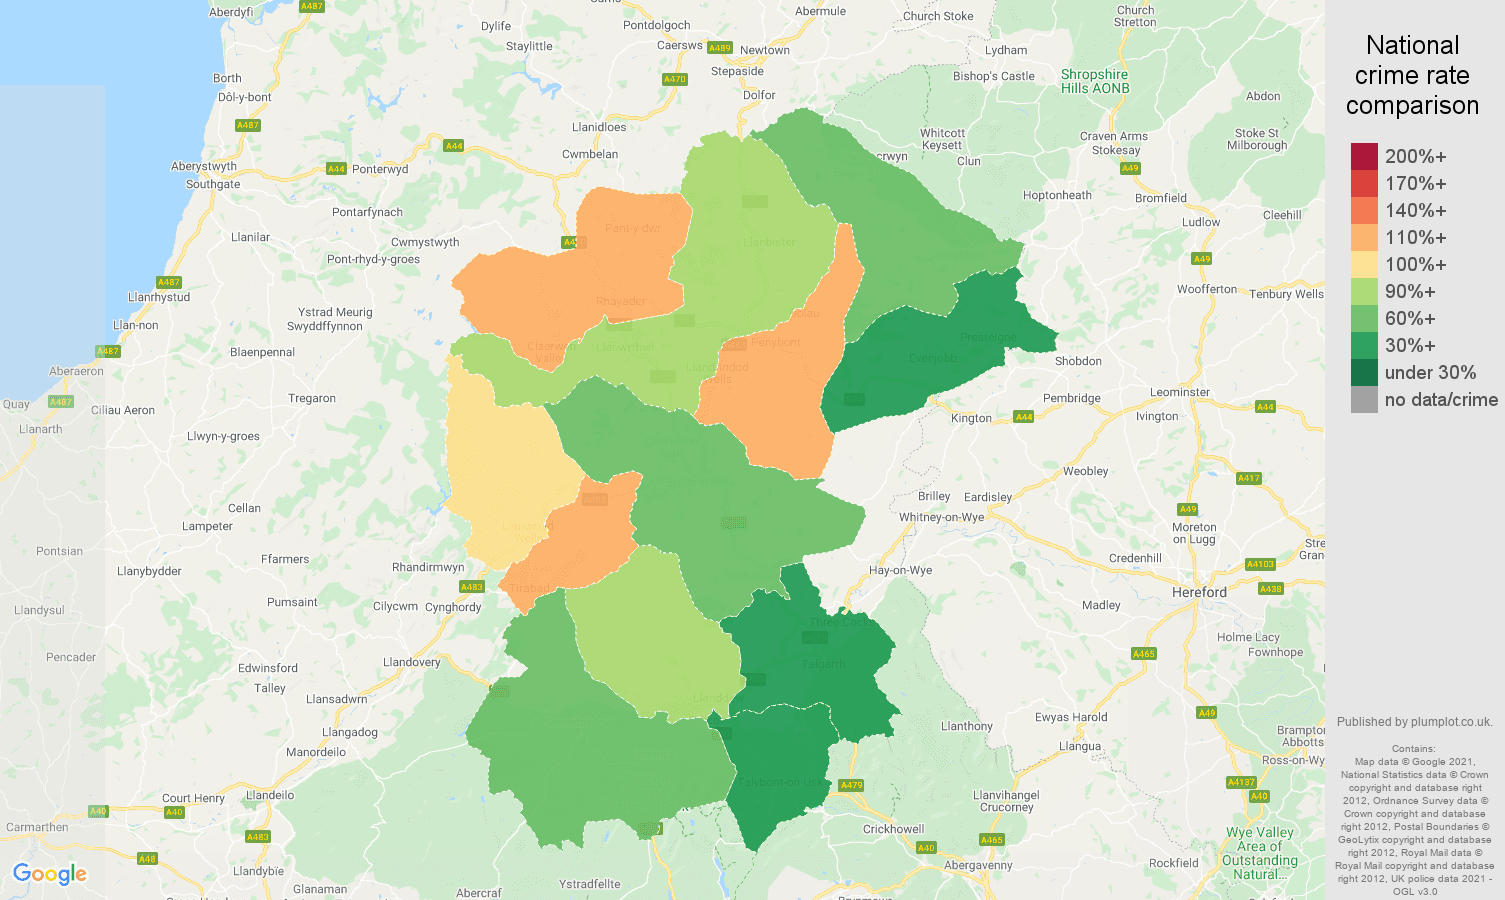 Llandrindod Wells antisocial behaviour crime rate comparison map